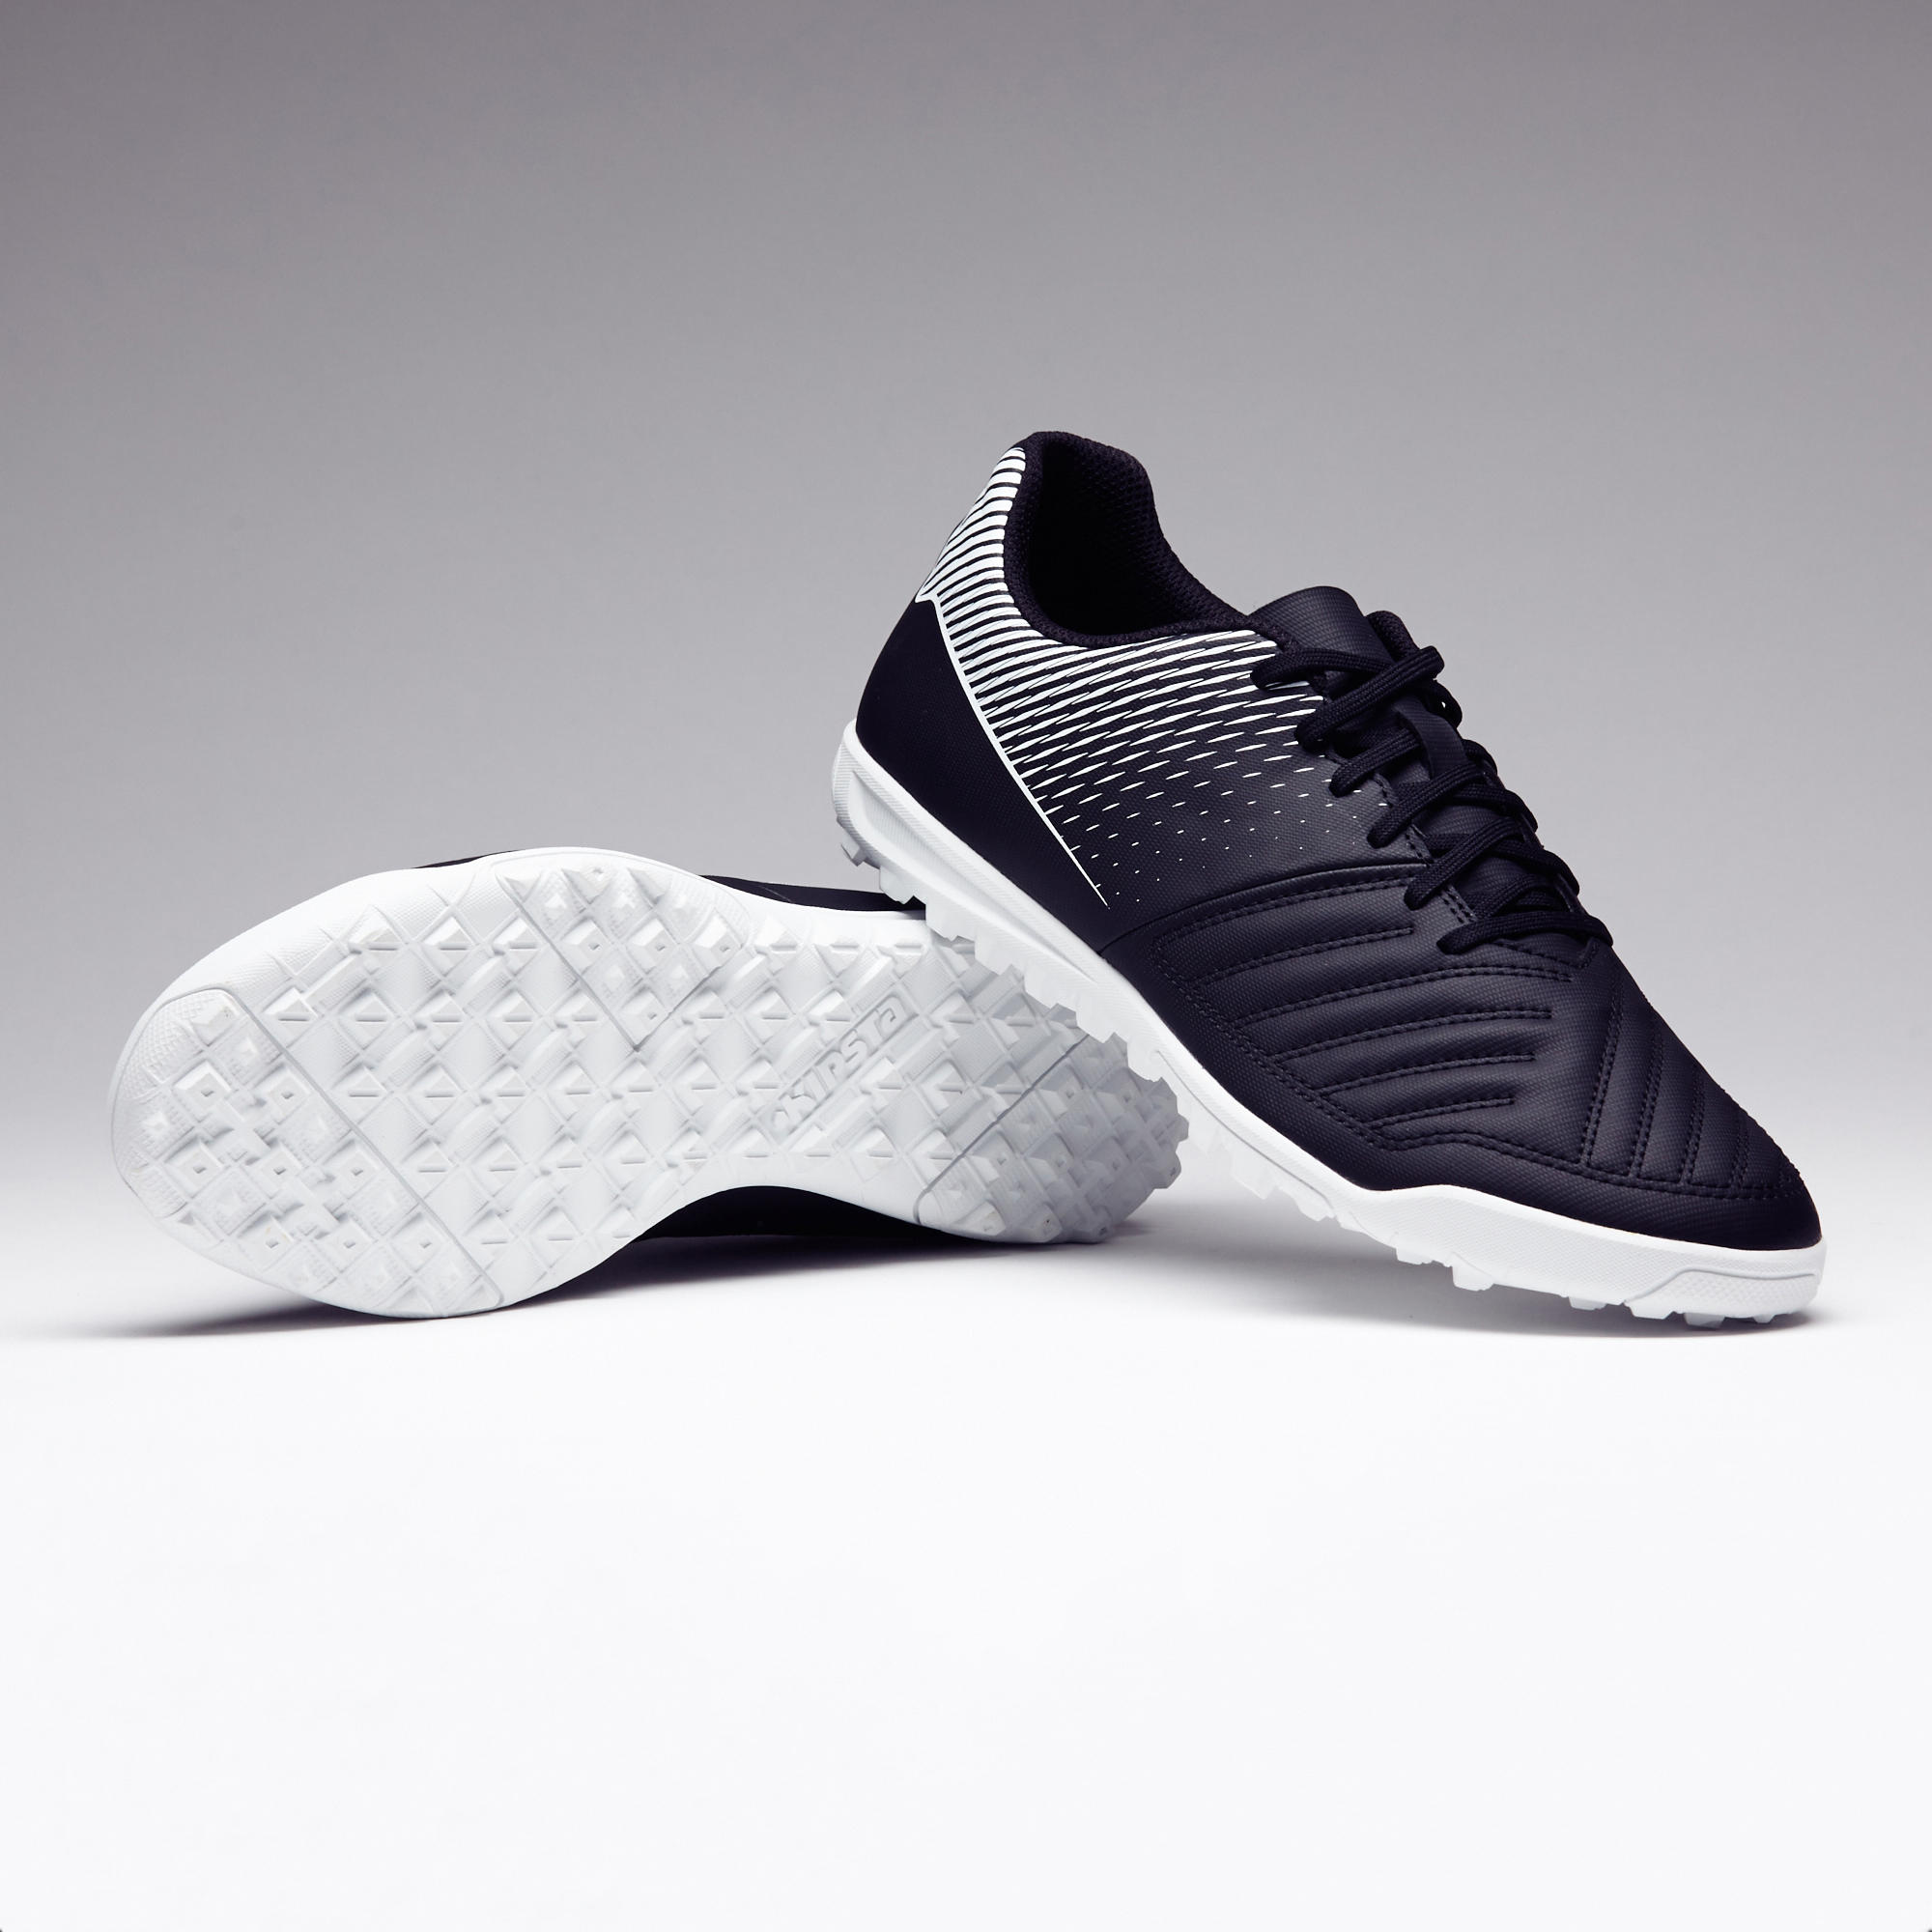 Buy Football Shoes \u0026 Football Boots